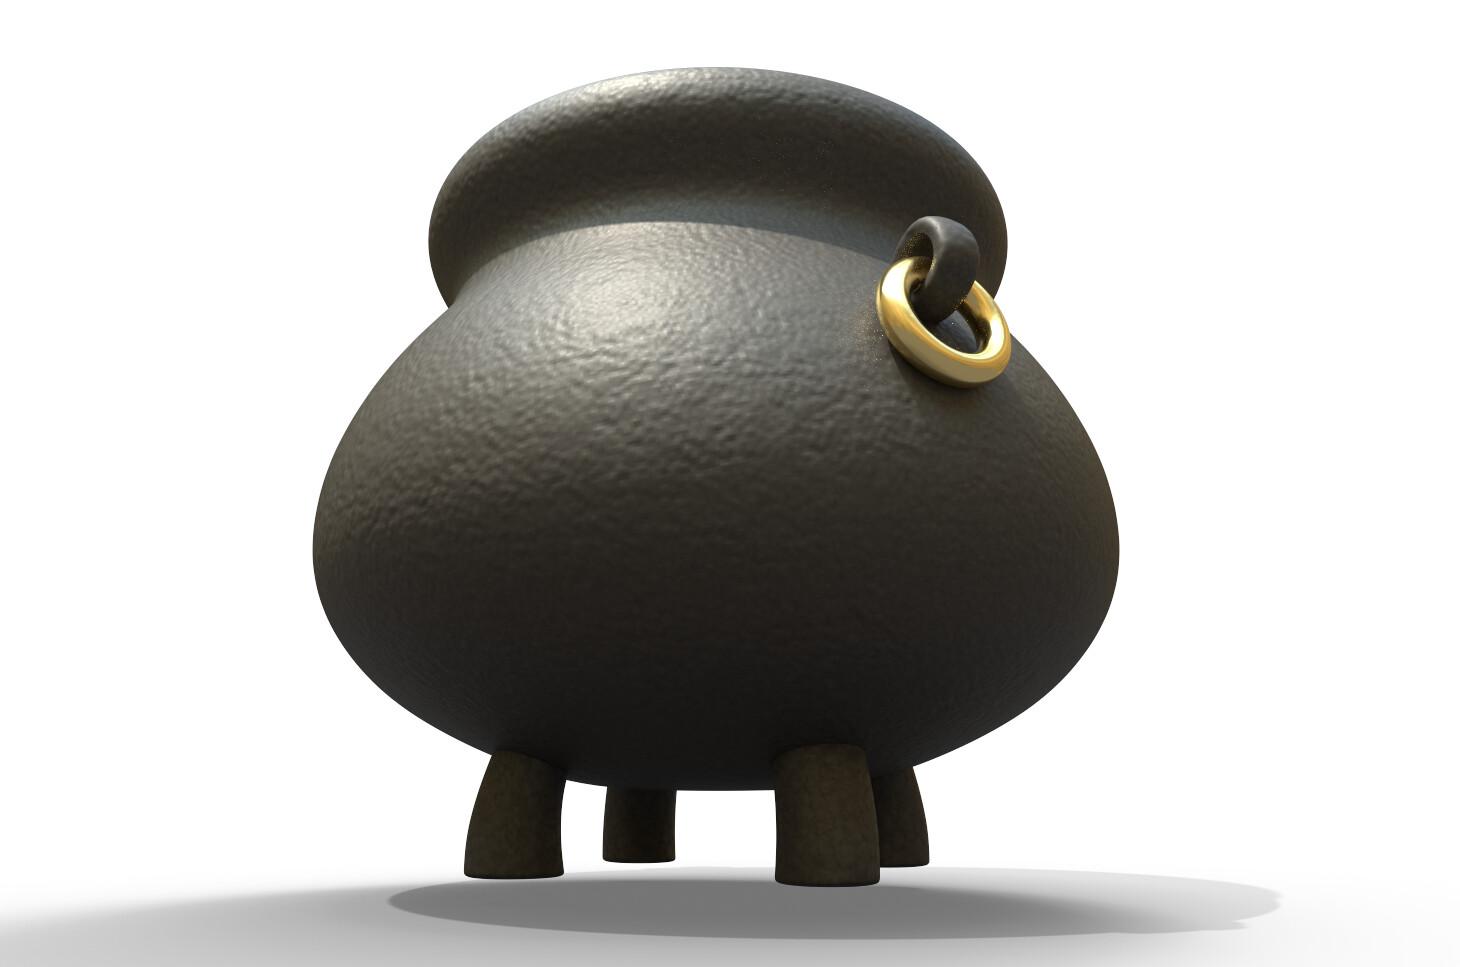 Joseph moniz cauldron001c